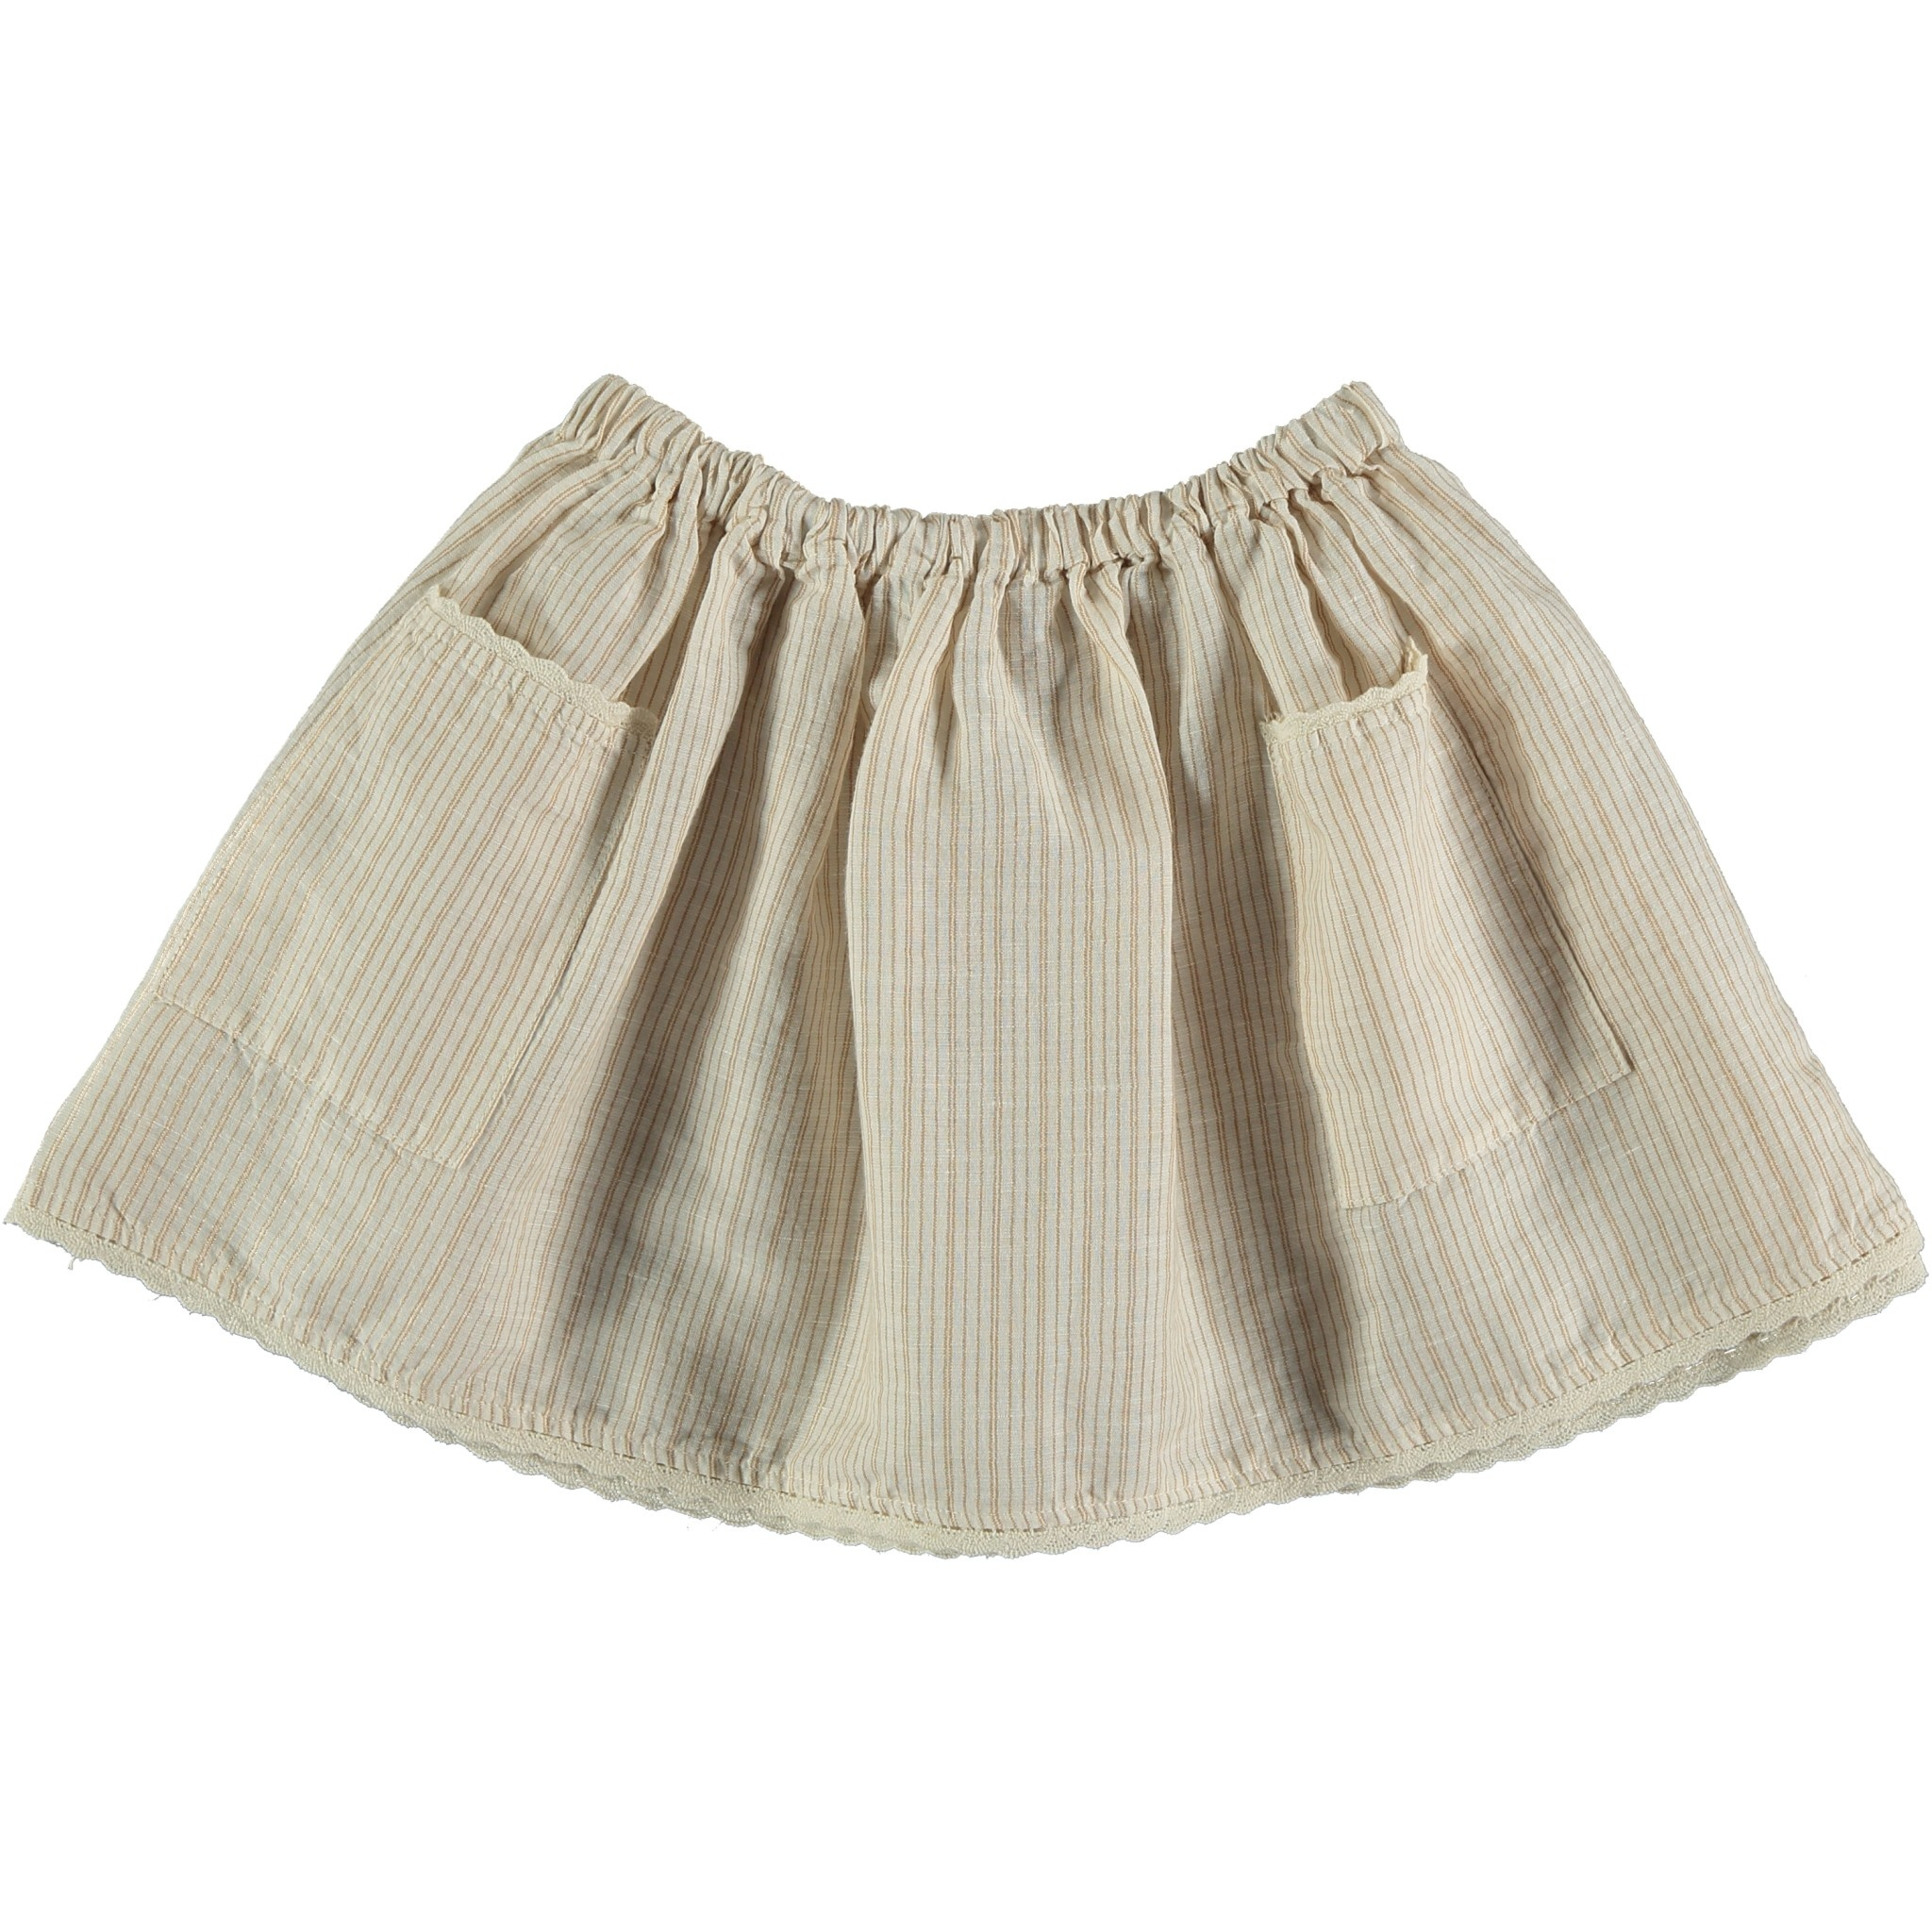 My Little Cozmo Linnen & Cotton striped skirt | cotton woven